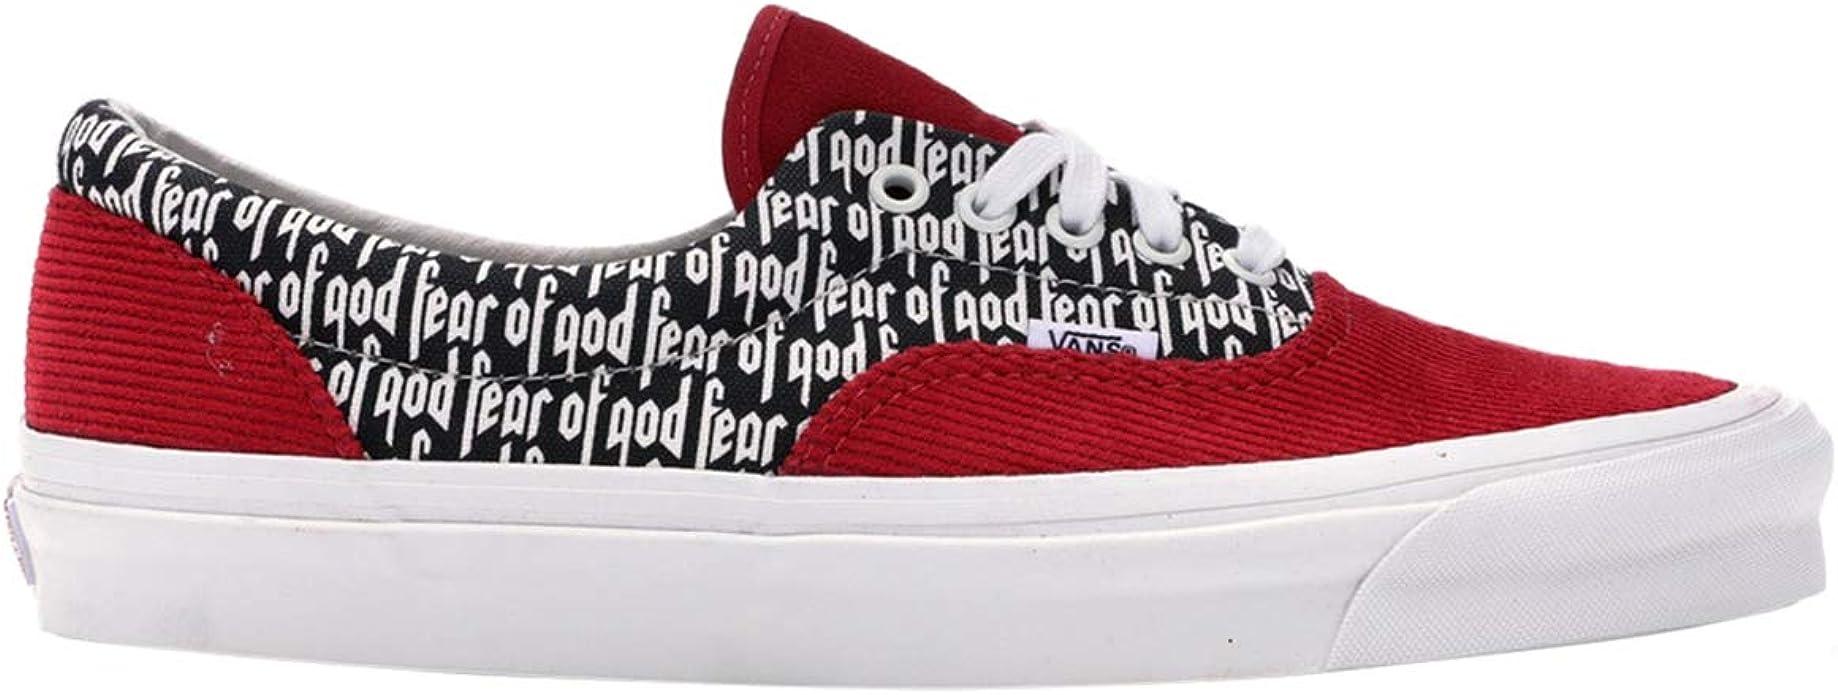 Vans Herren Era 95 Dx Fear of God, Rot (RedCorduroyPrint